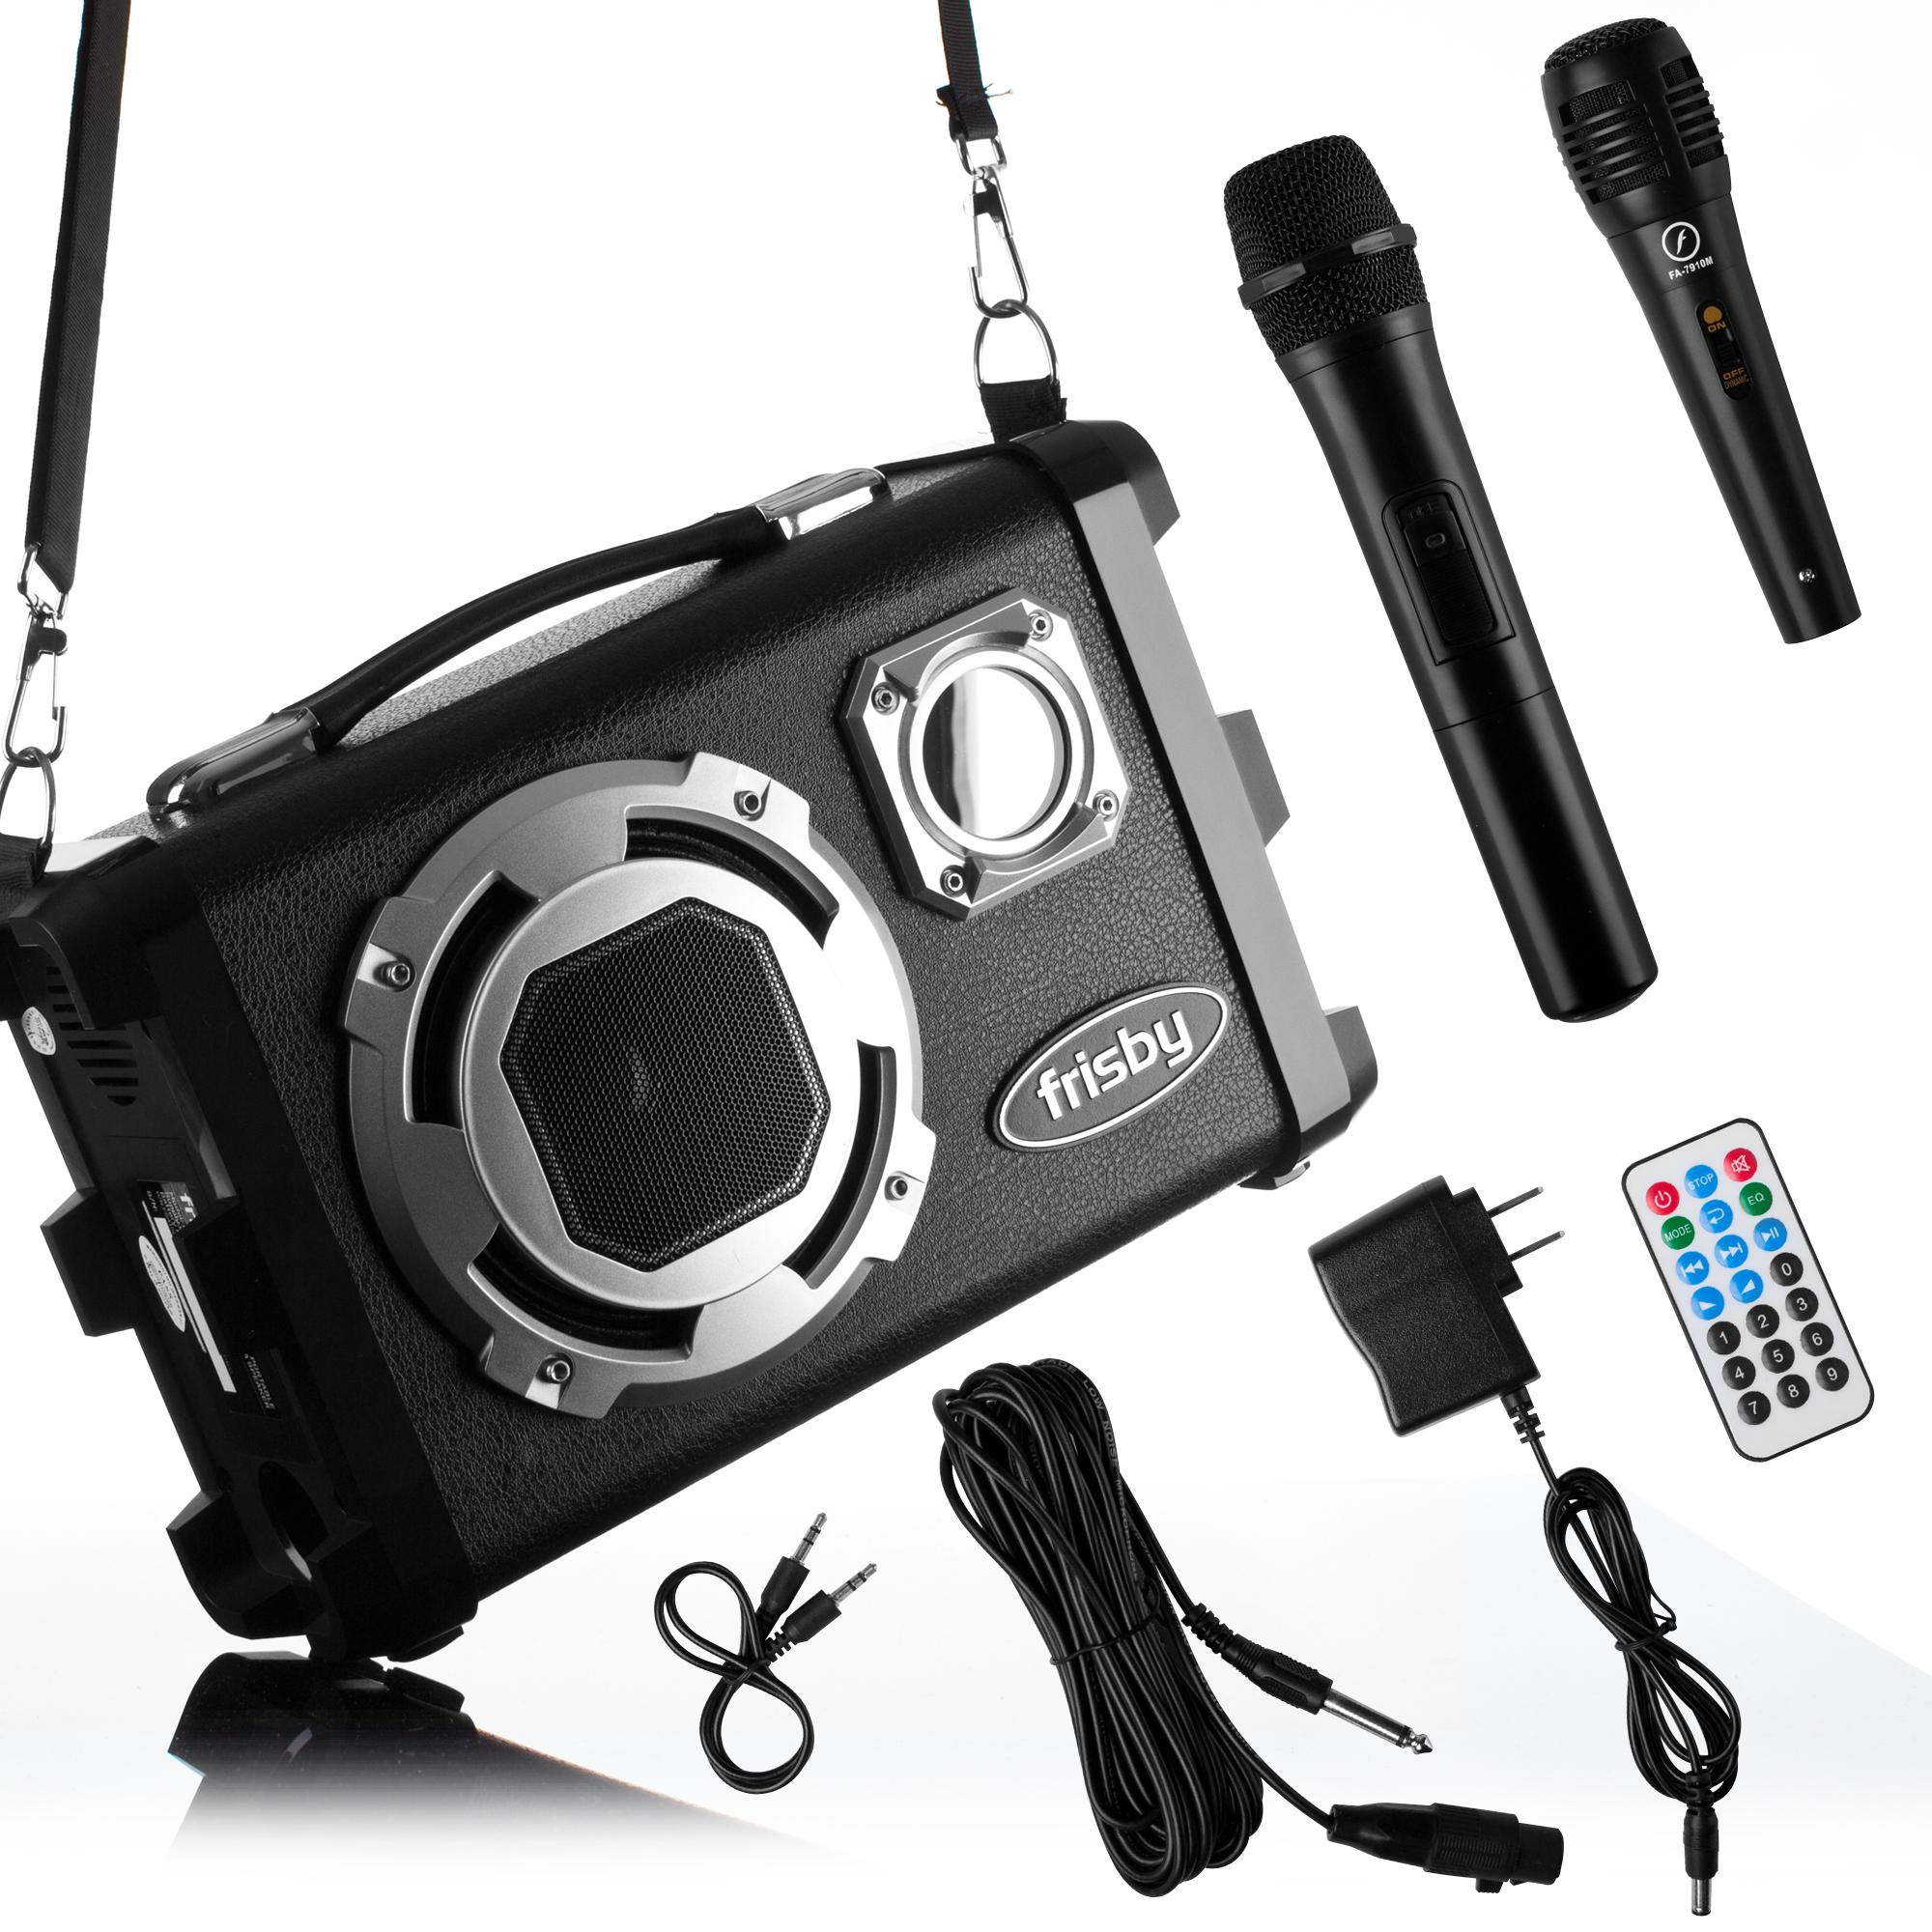 Frisby FS-4150P Portable Rechargeable Bluetooth Karaoke